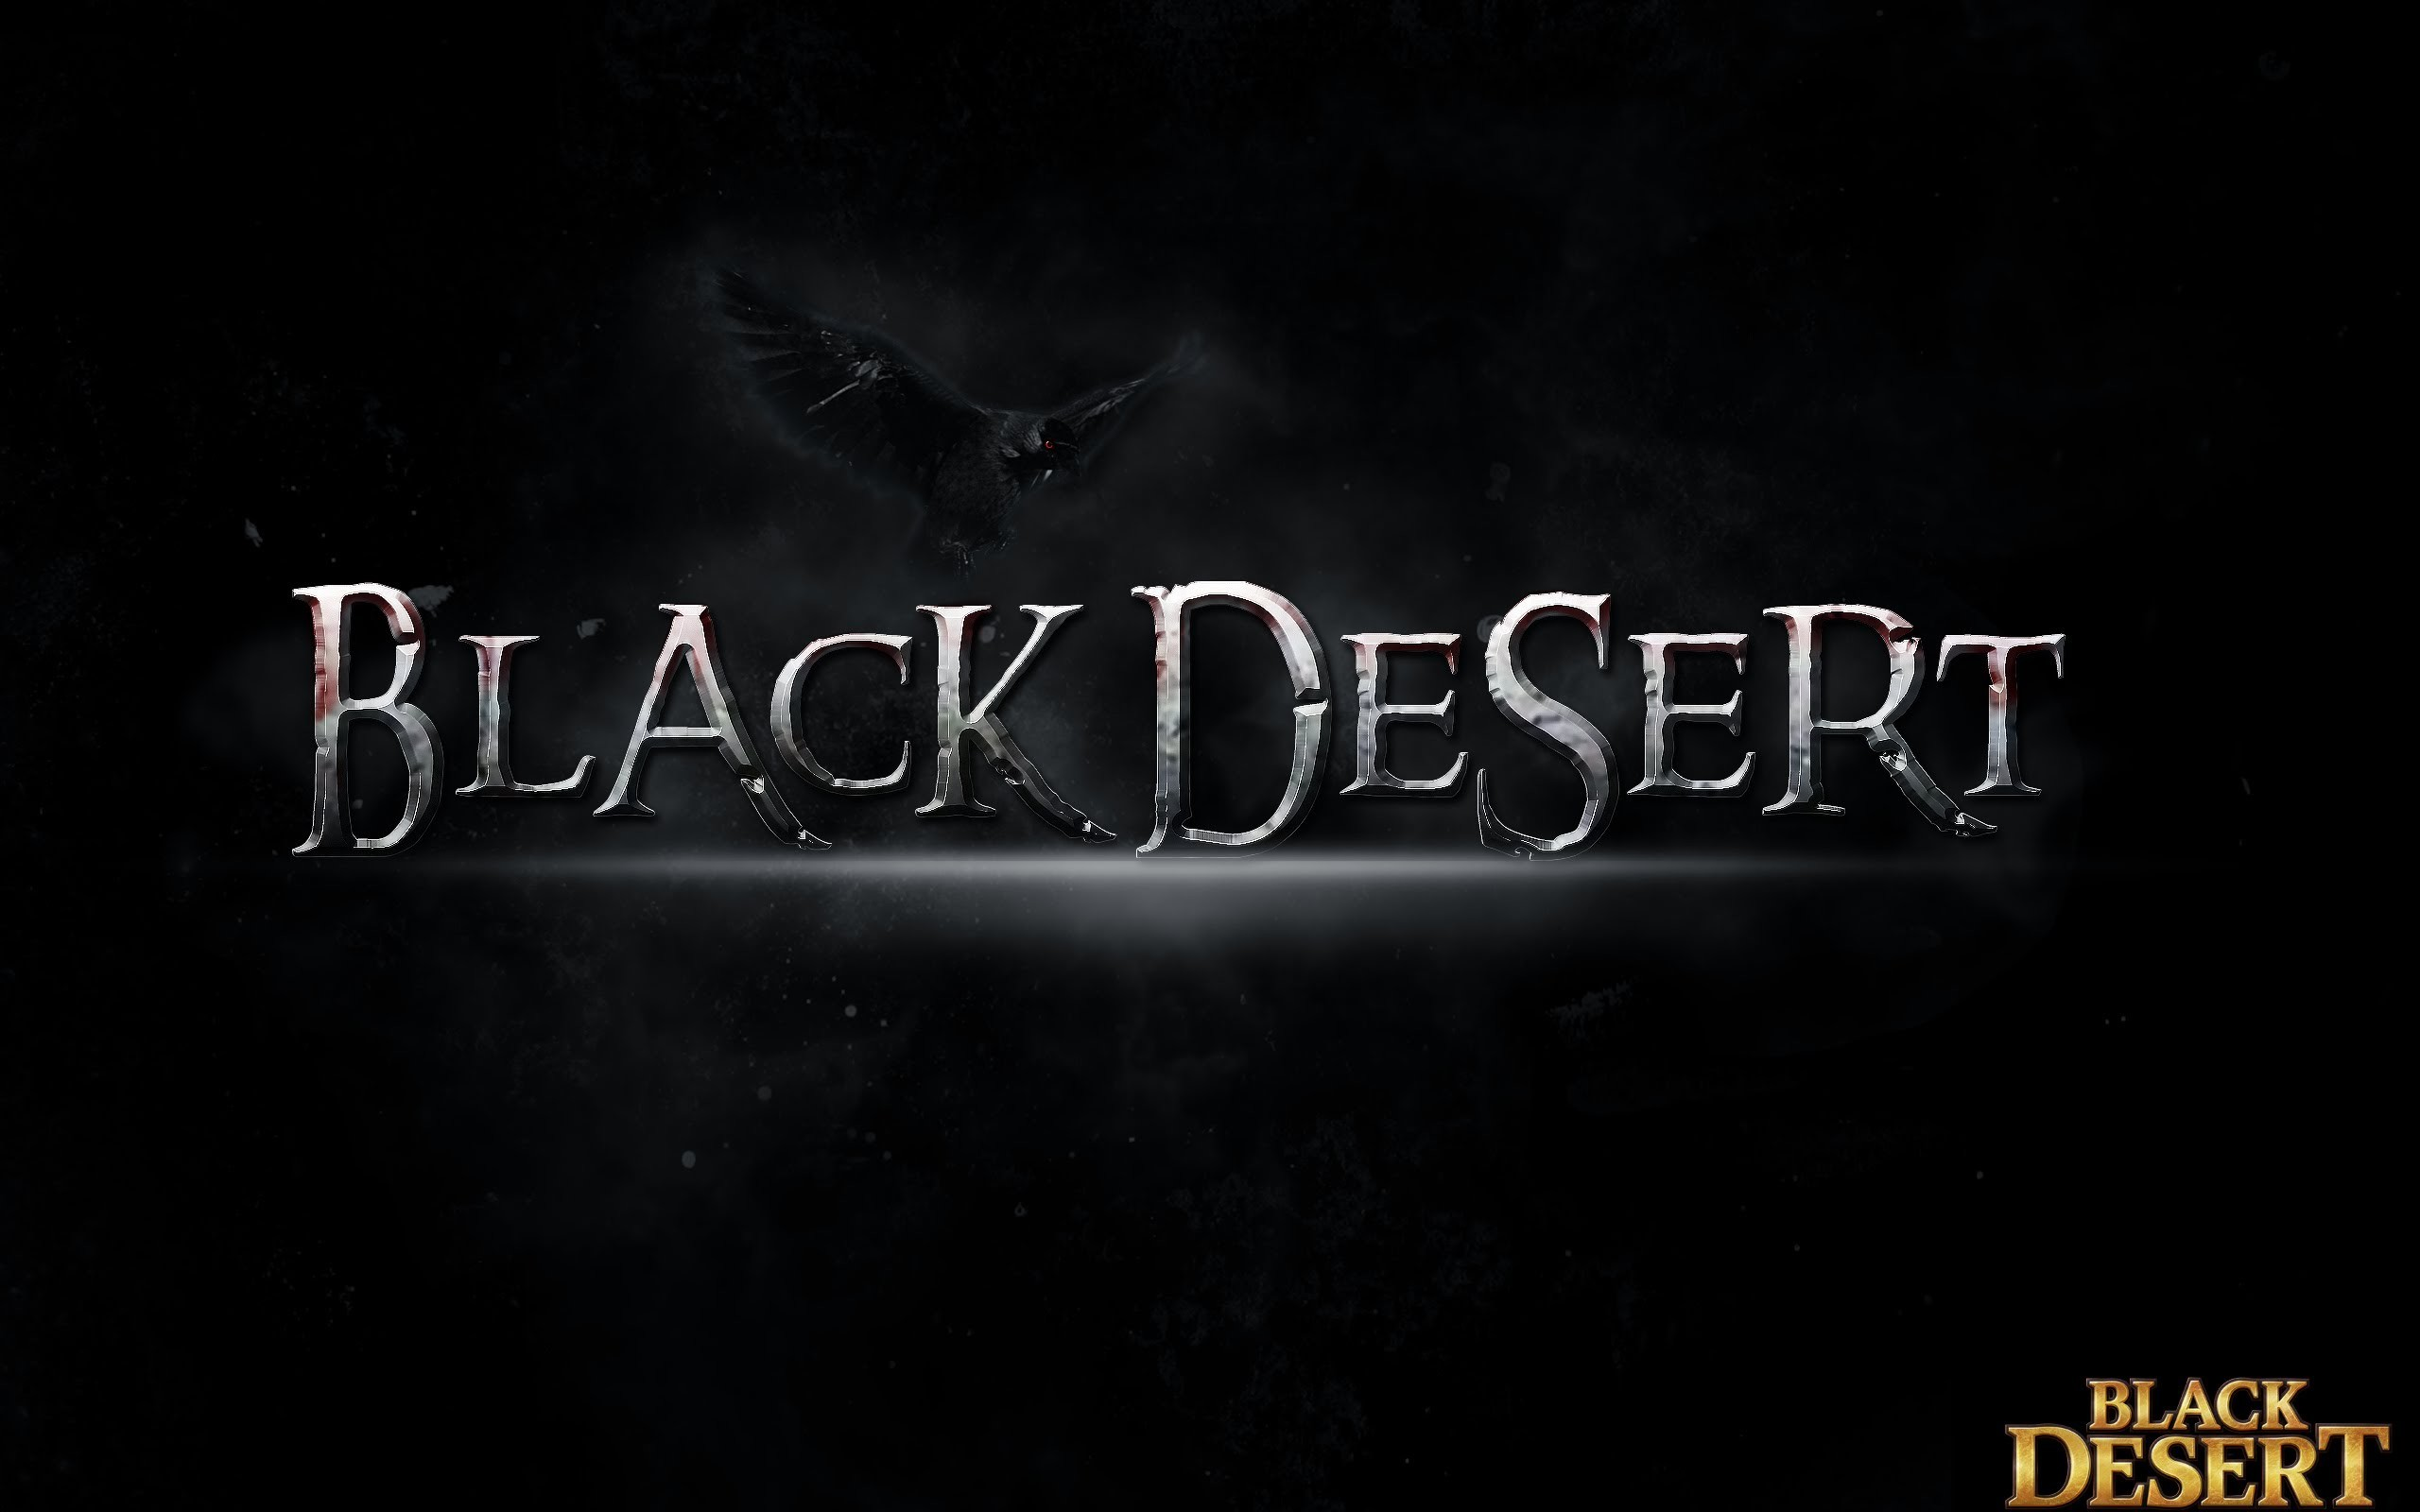 wallpaper.wiki-Black-Desert-Backgrounds-PIC-WPC009378